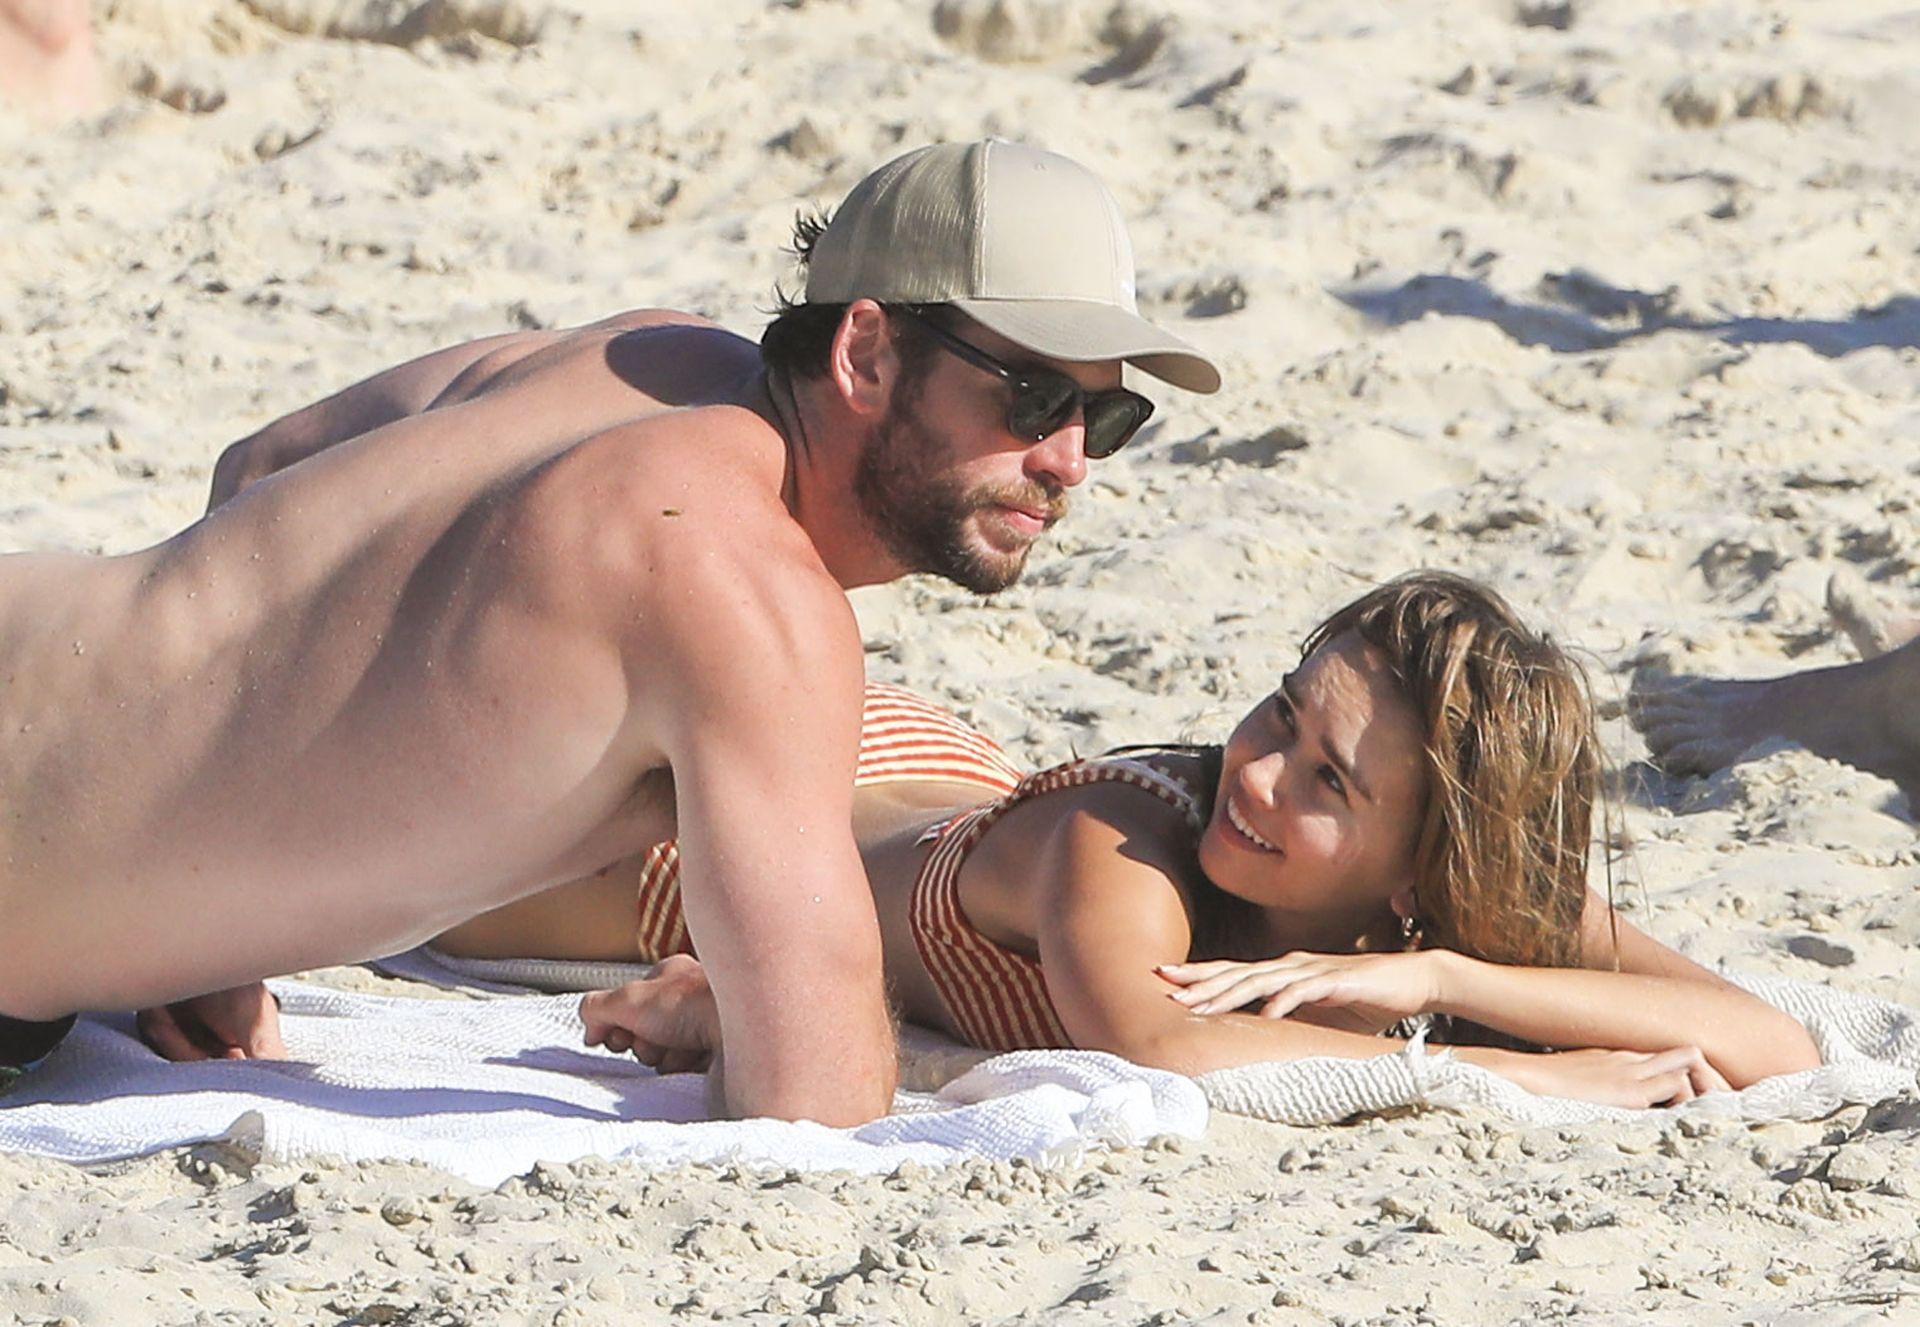 Gabriella Brooks Hot – Liam Hemsworth's New Girlfriend 0003